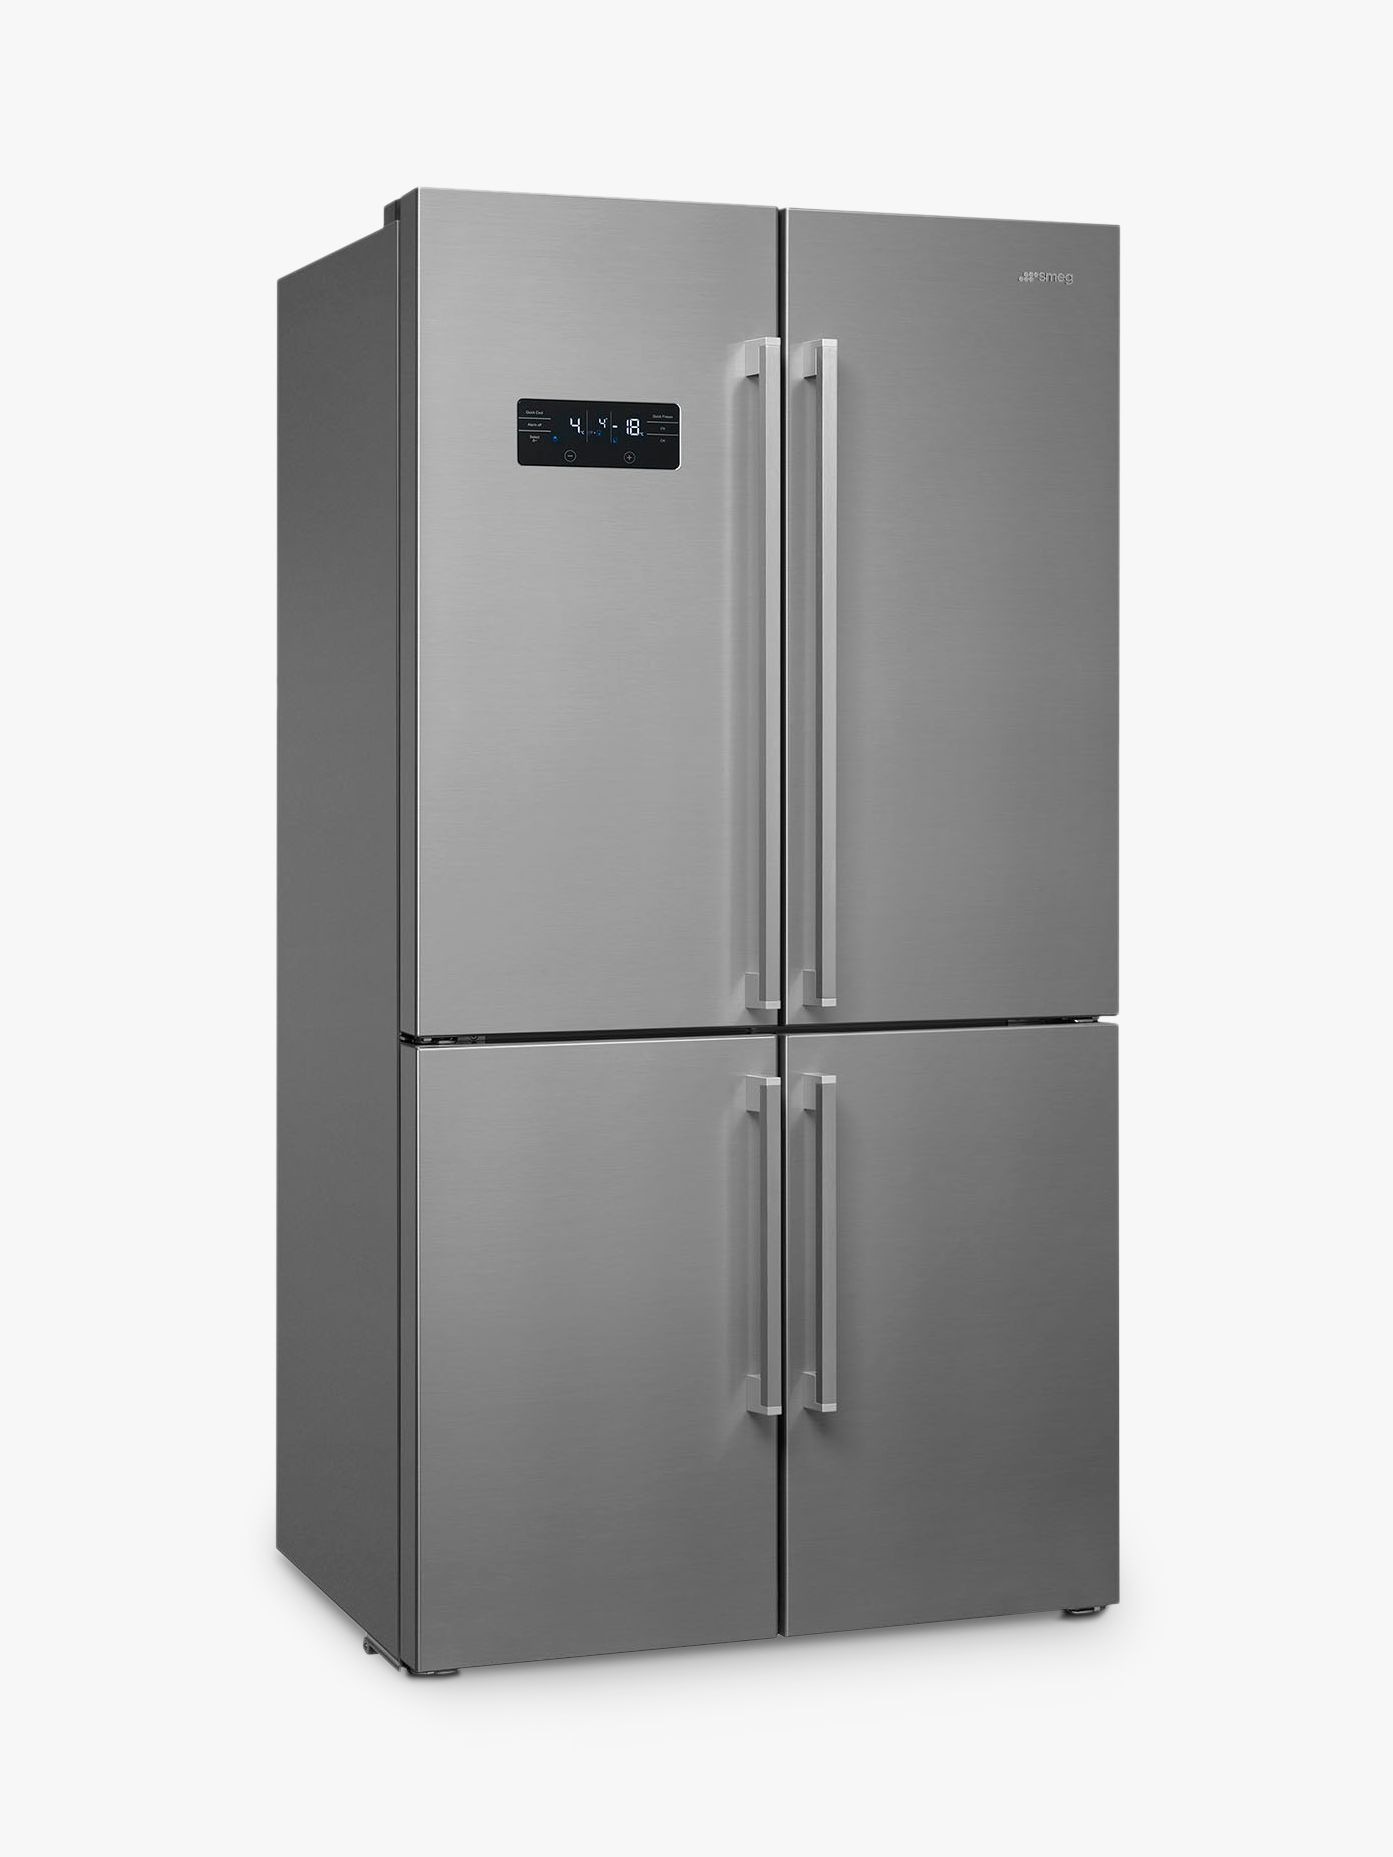 Smeg Fq60x2peai 4 Door American Style Fridge Freezer A Energy